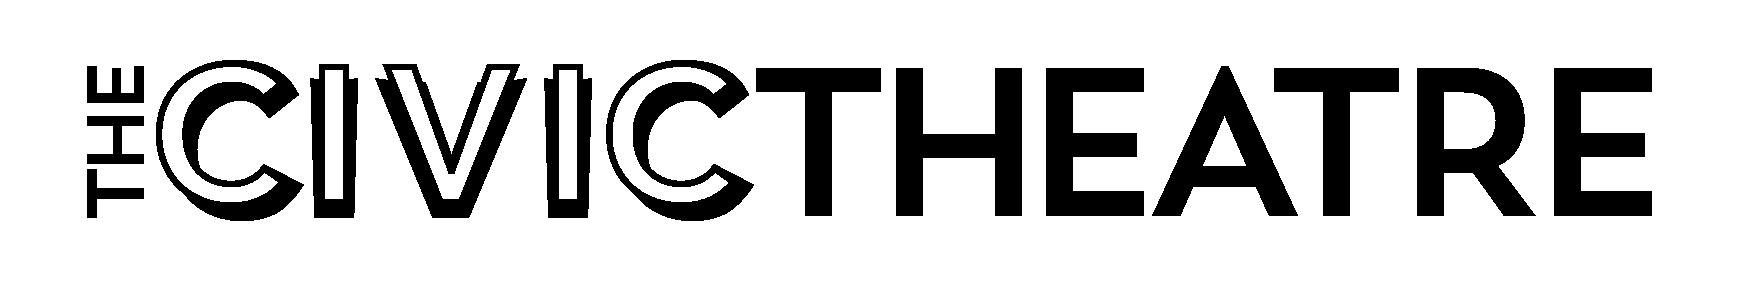 Civic Theatre logo